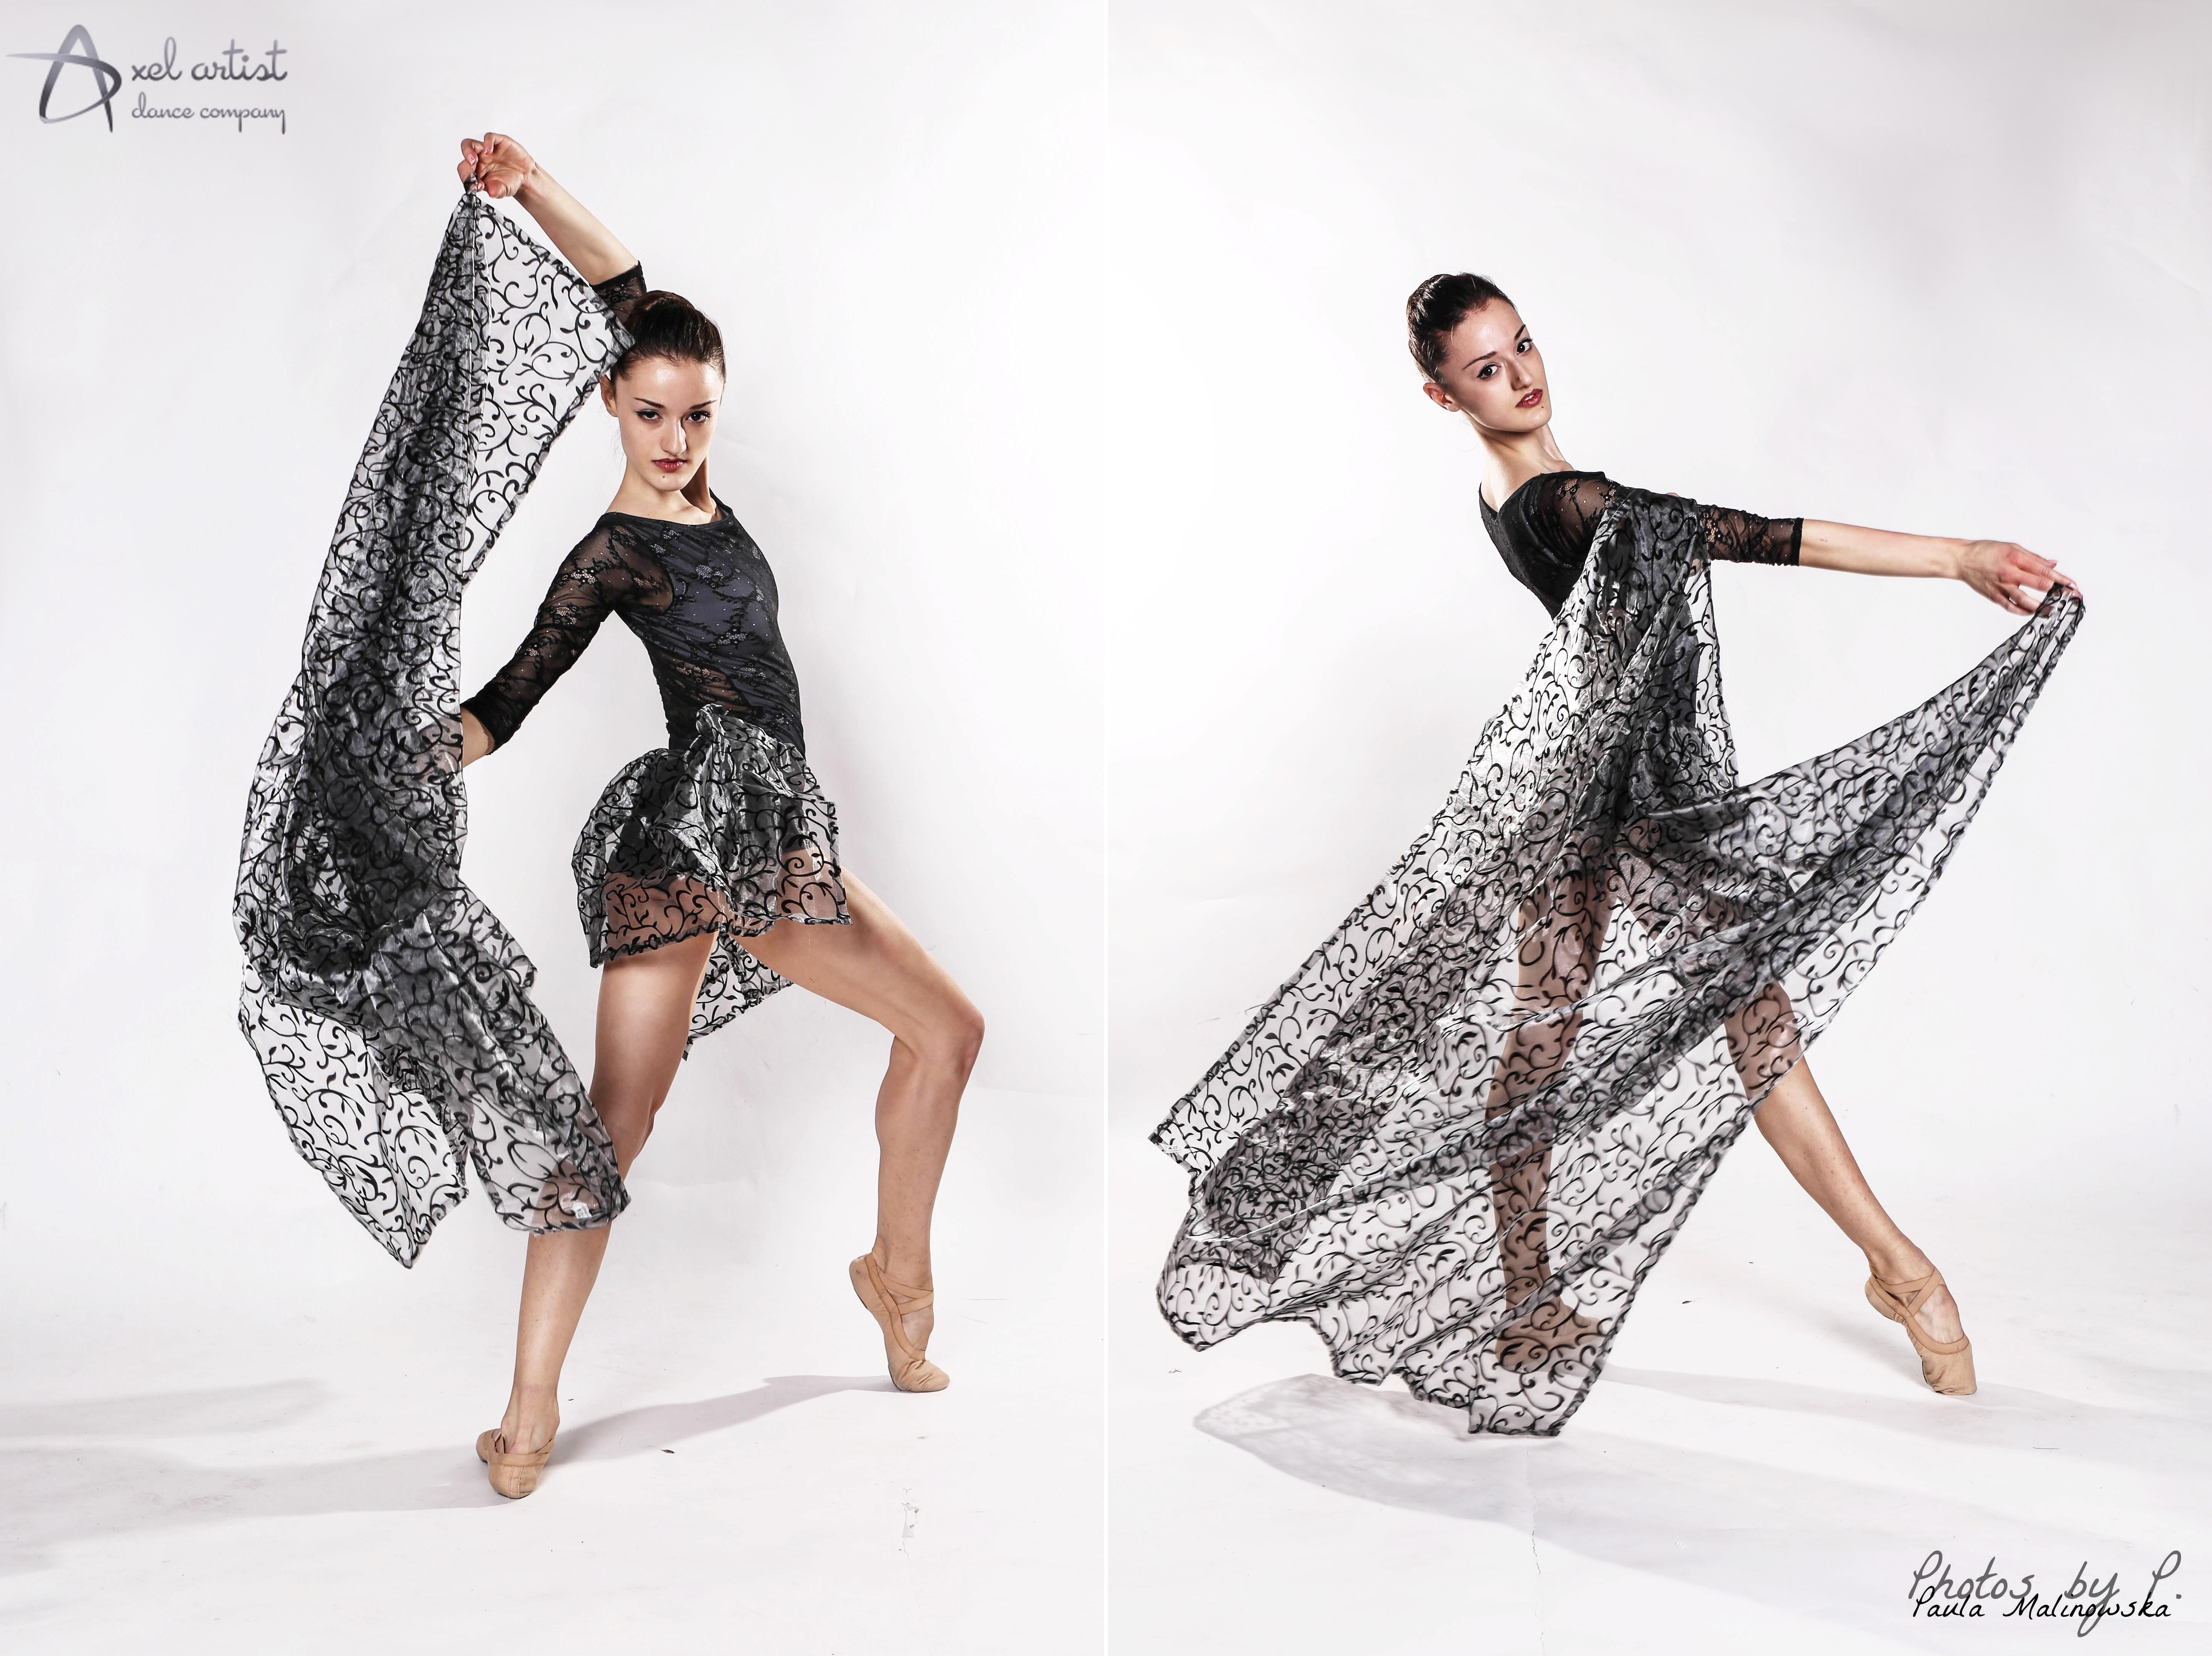 Ballett (3).jpg